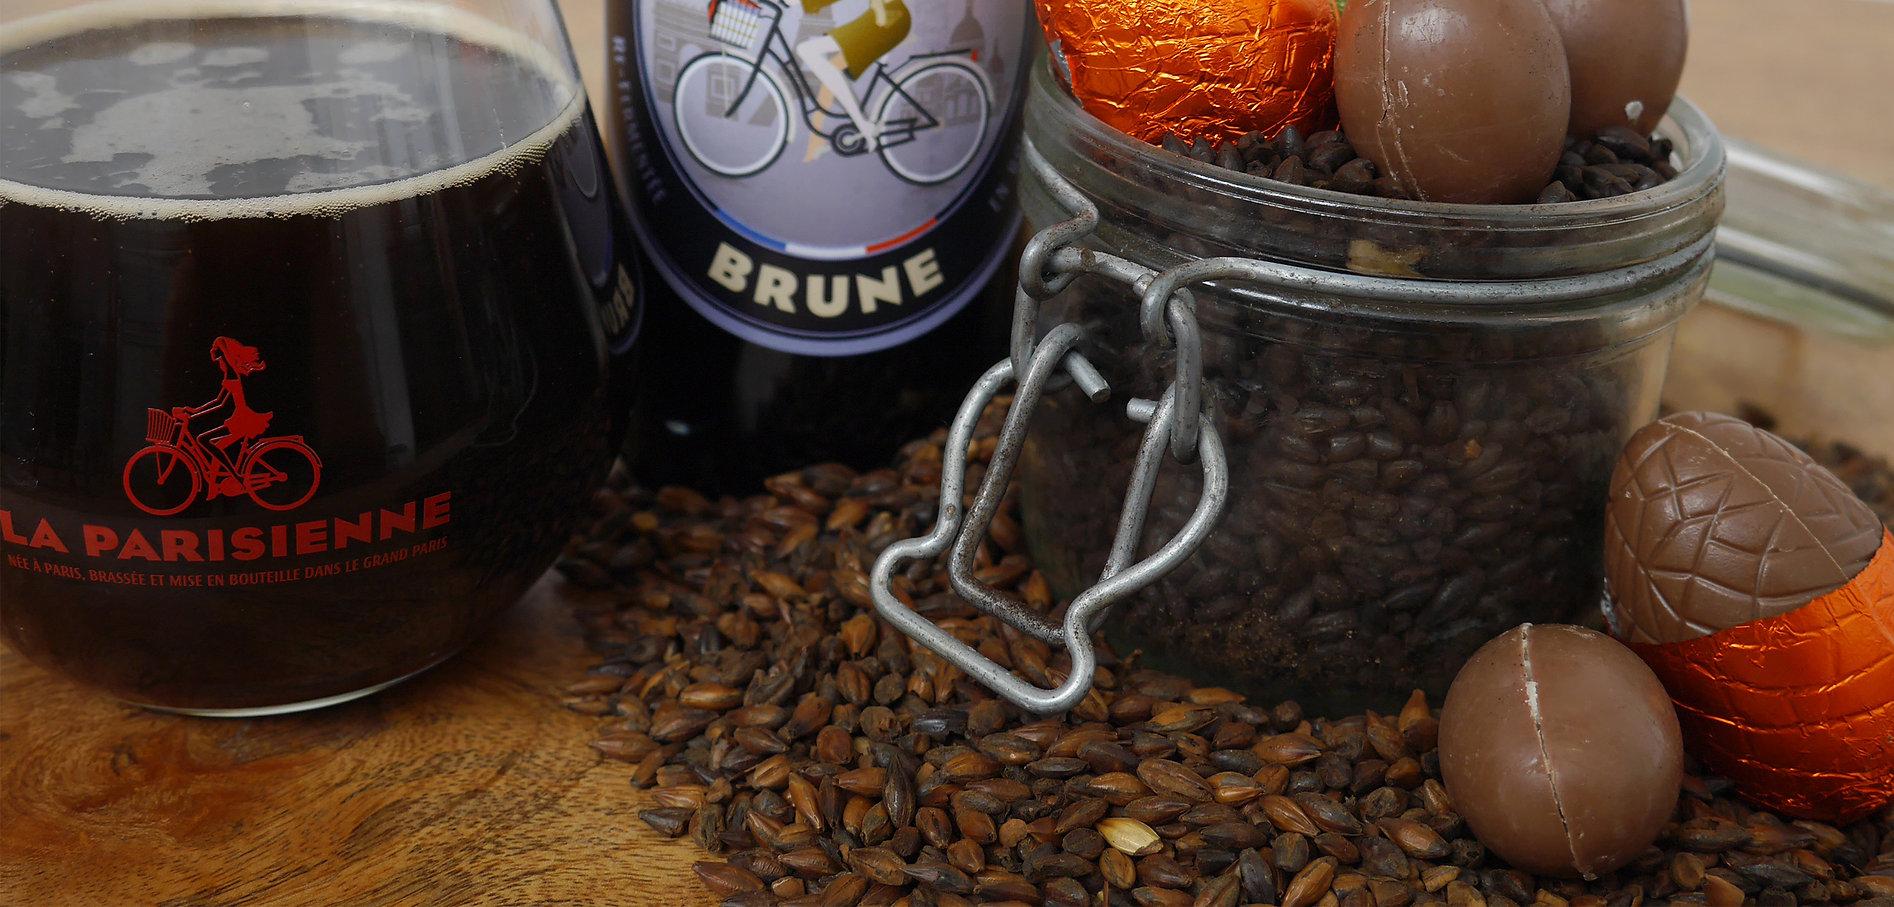 La Brune Brasserie La Parisienne.jpg